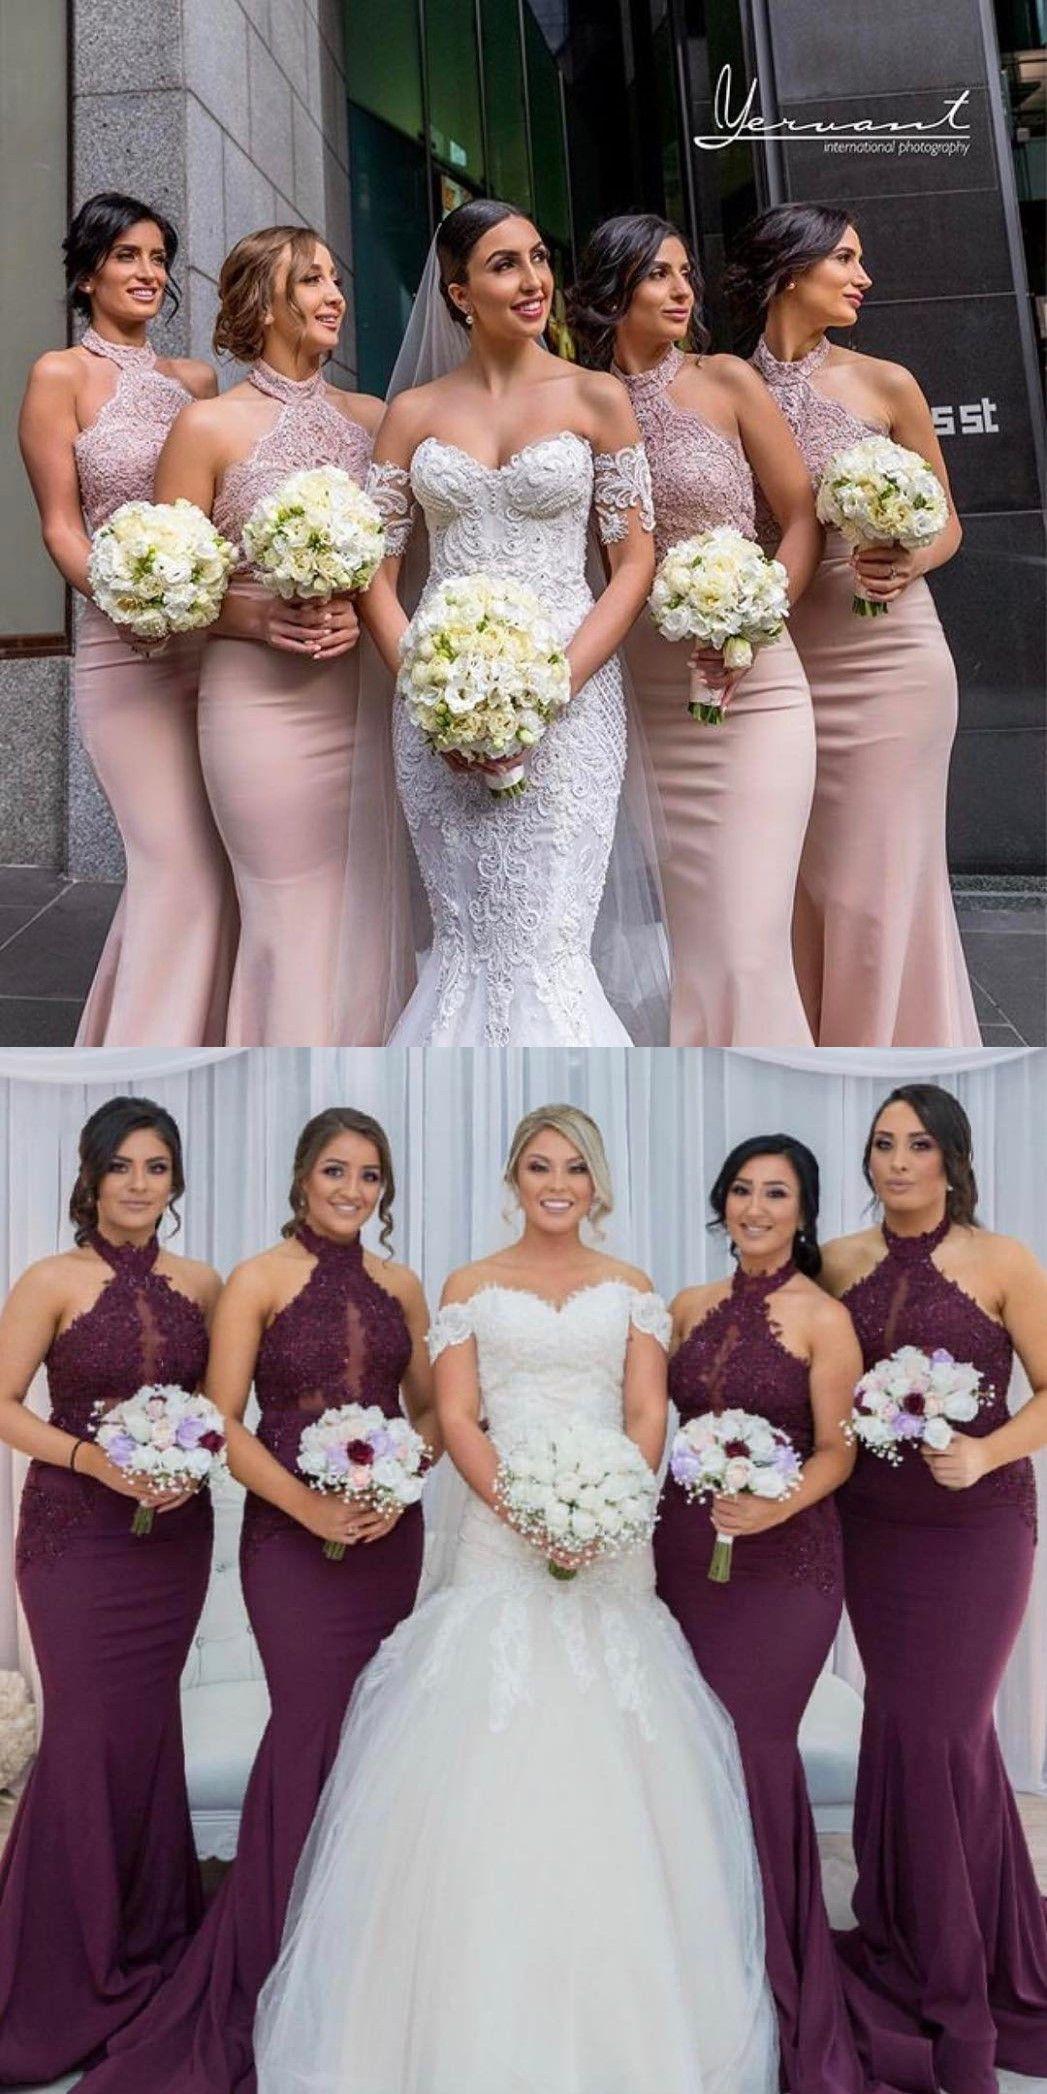 Bridesmaid Dresses Pink Mermaid Long Bridesmaid Dresses Burgundy Long B Mermaid Bridesmaid Dresses Wedding Bridesmaid Dresses Mermaid Long Bridesmaid Dresses